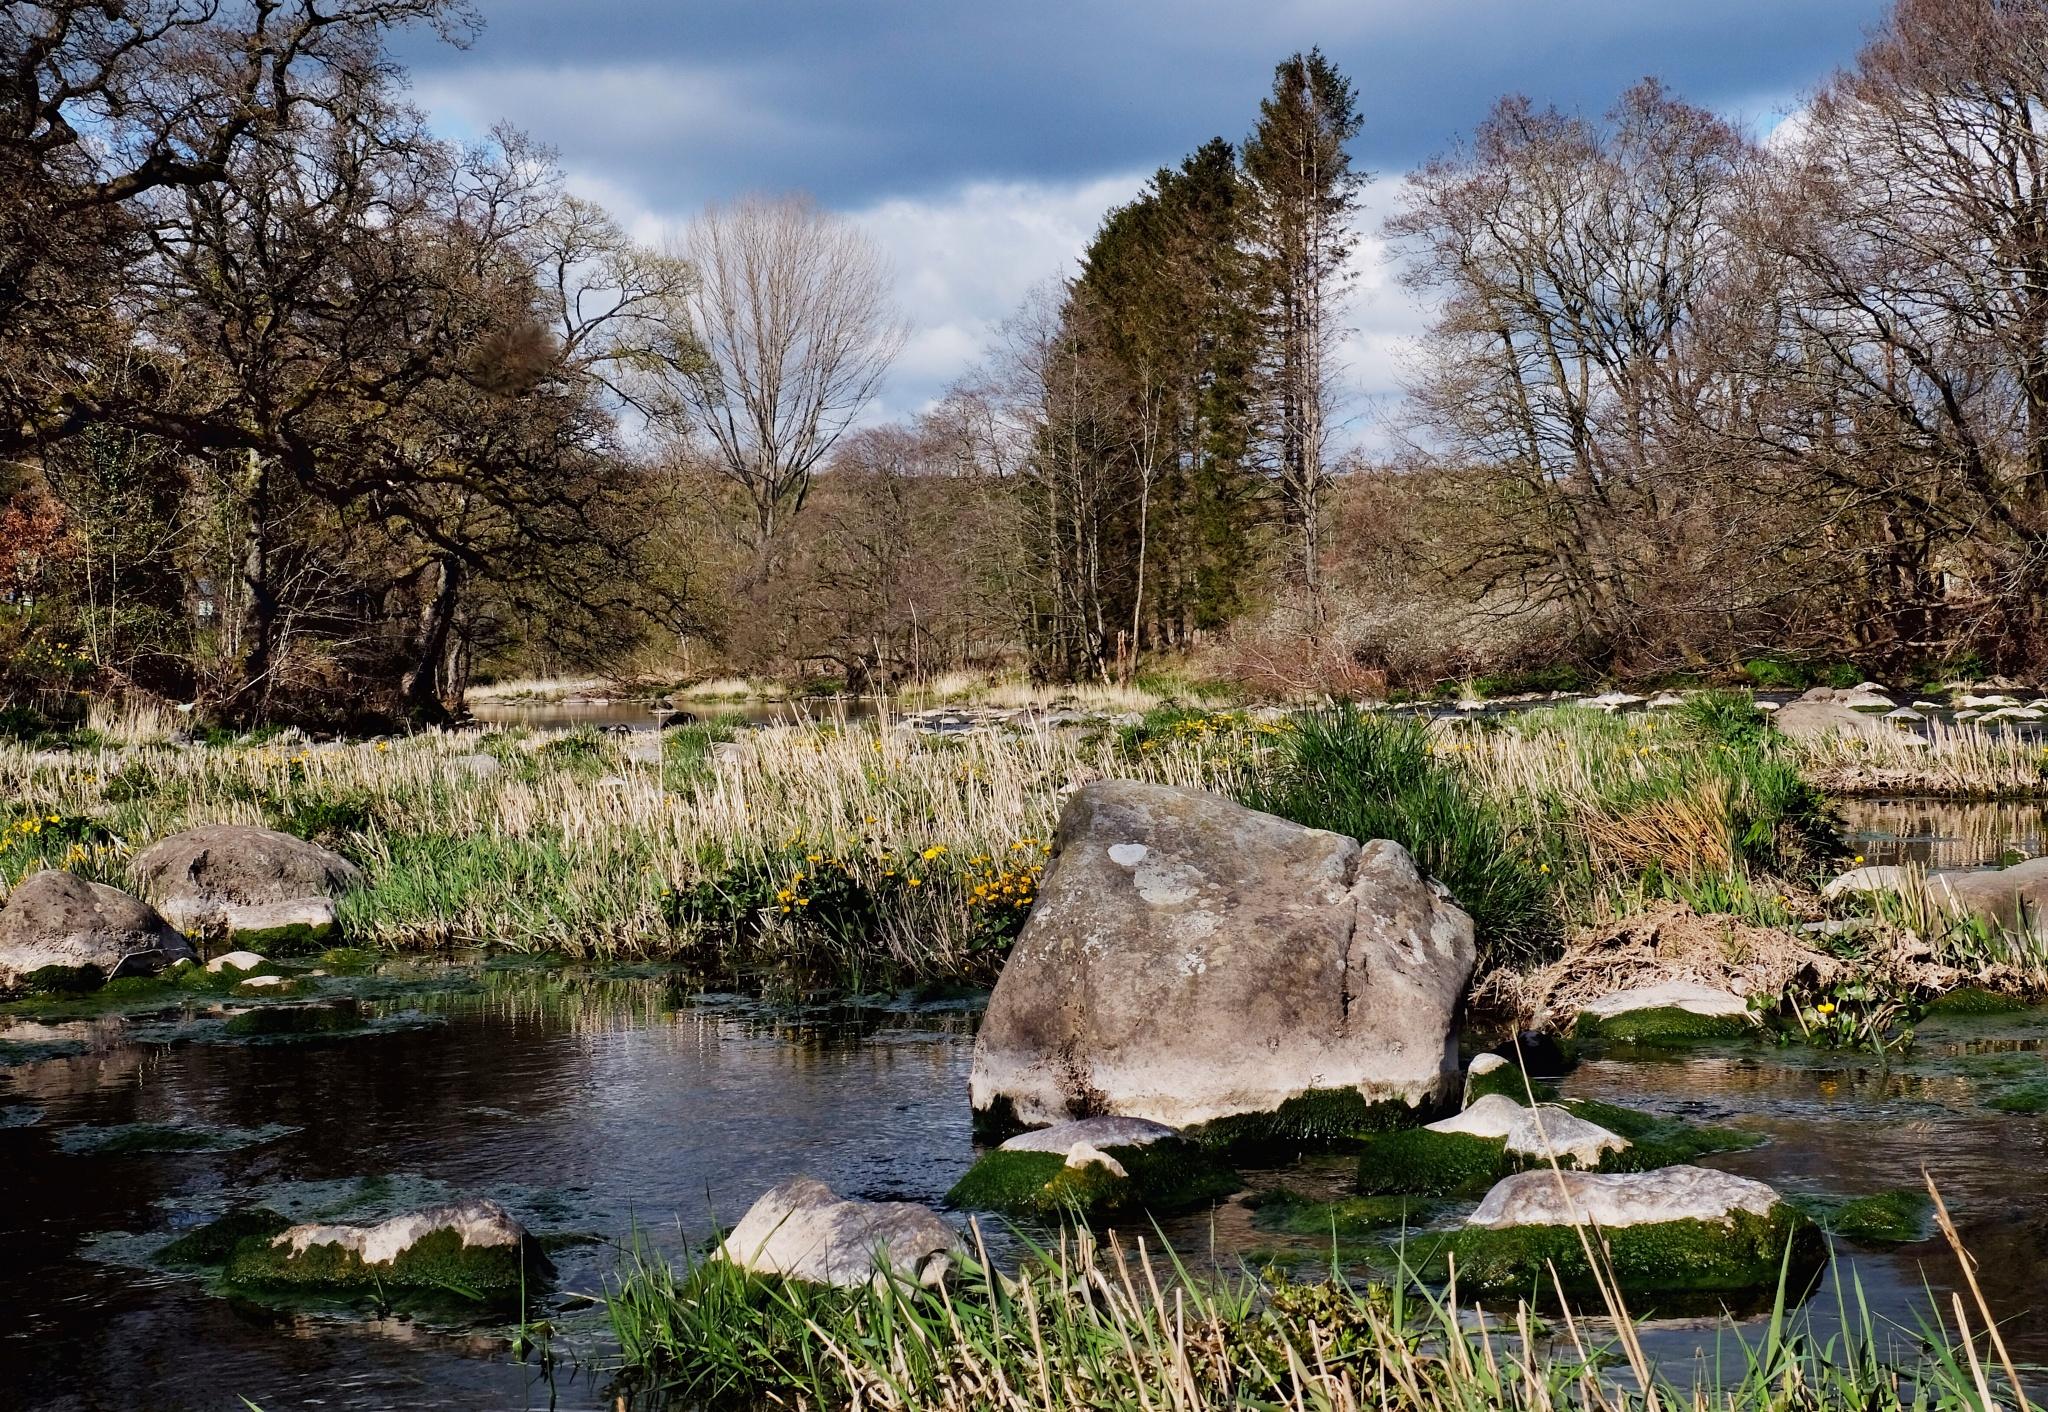 Tales of the Riverbank by Steve Randles